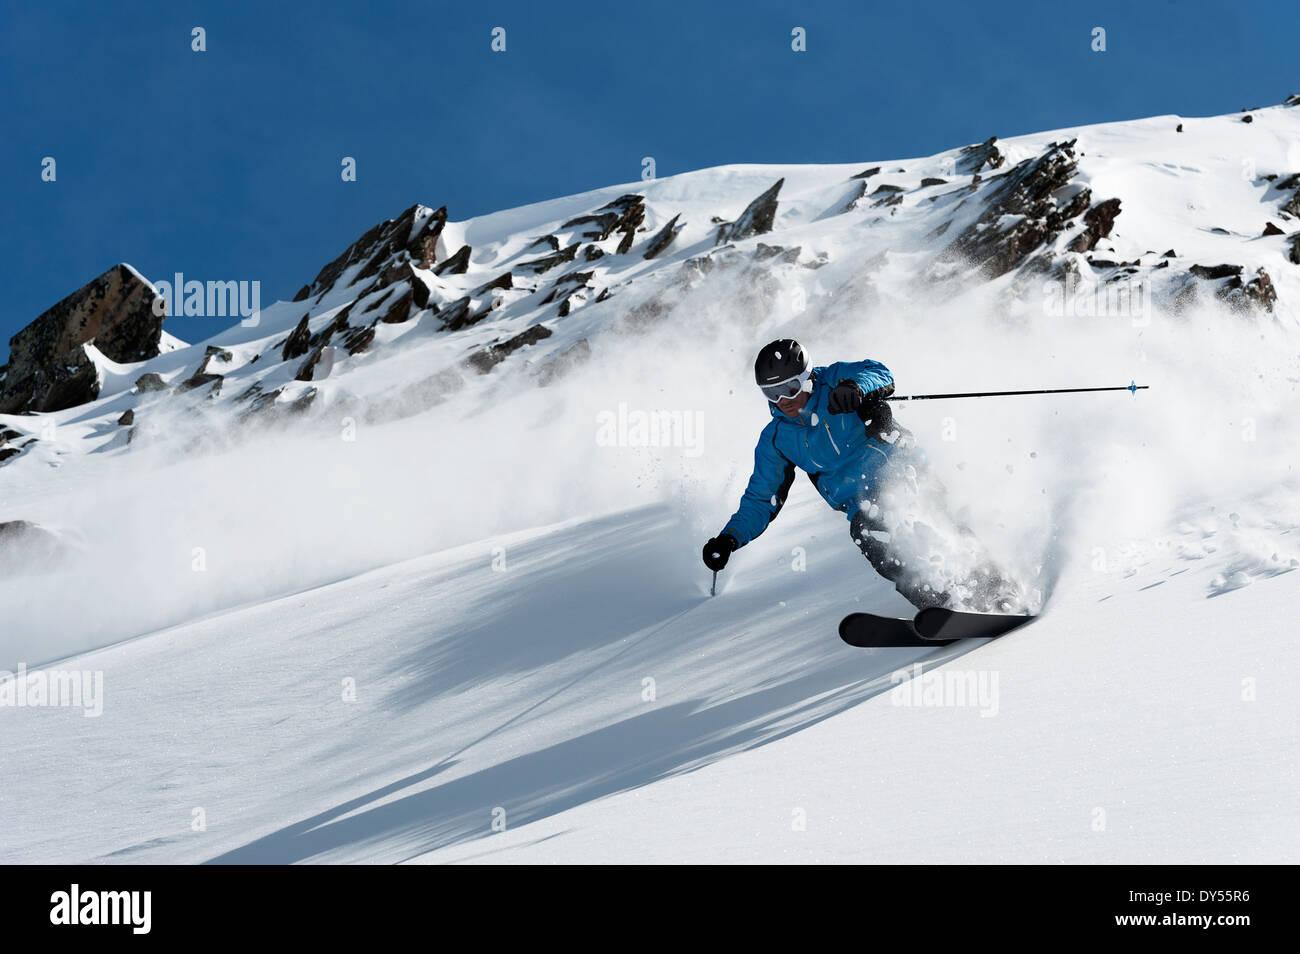 Man skiing downhill, Obergurgl, Austria - Stock Image